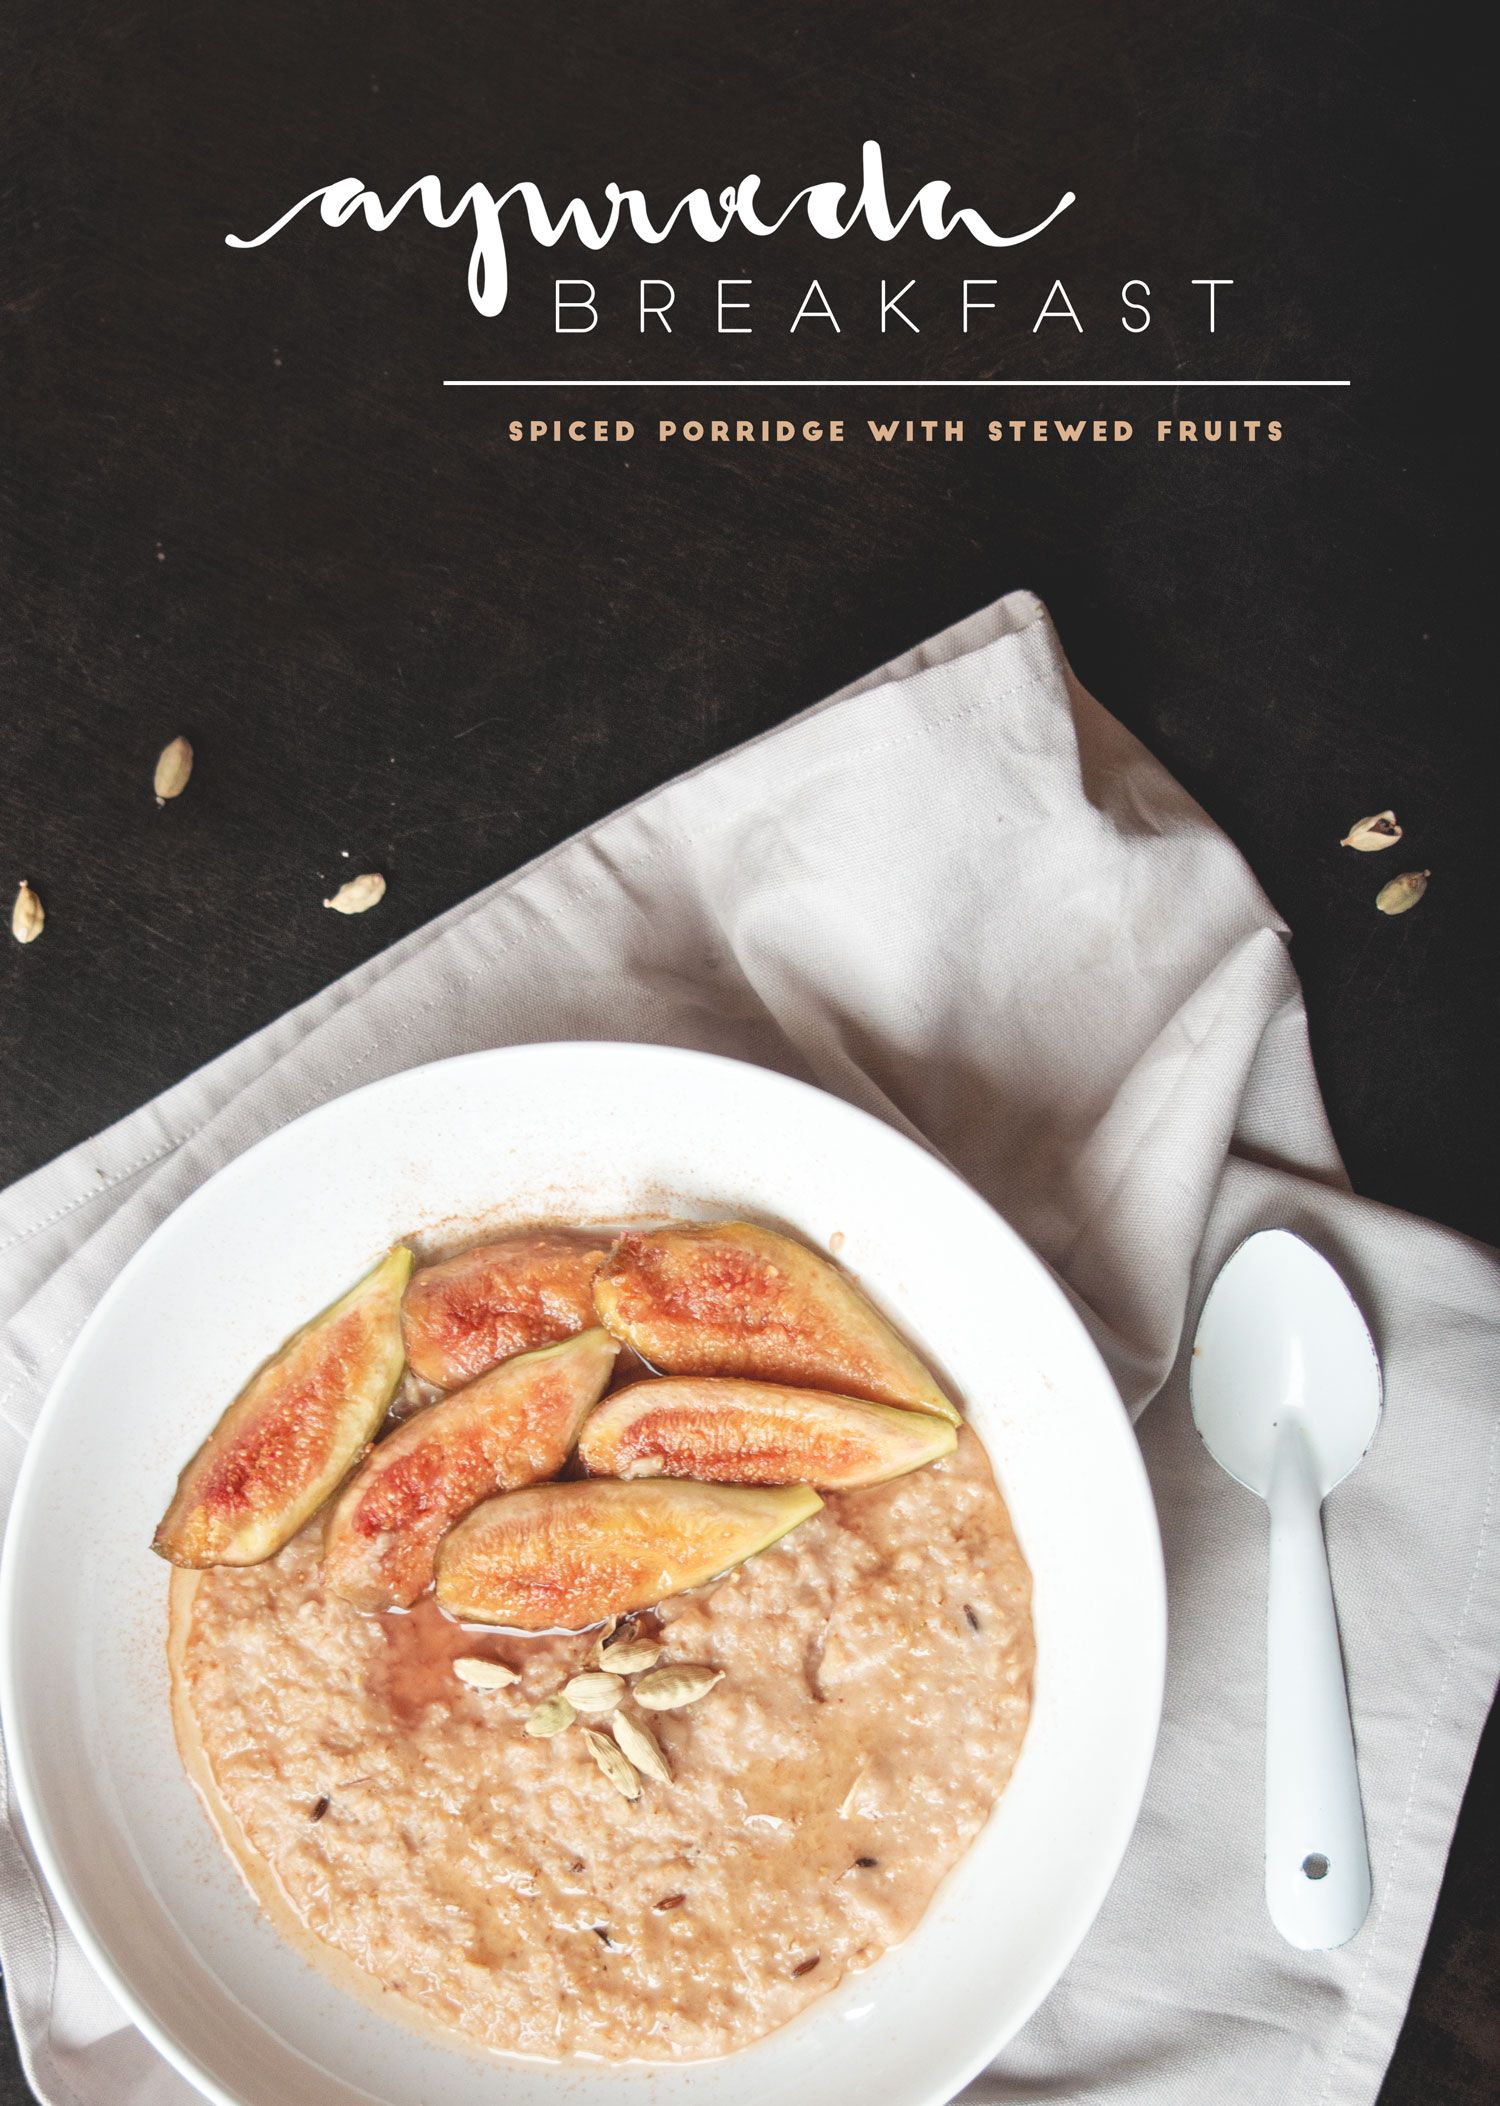 Ayurveda Breakfast Spiced Porridge With Stewed Fruits Juyogi Ayurvedic Recipes Ayurveda Recipes Ayurveda Breakfast